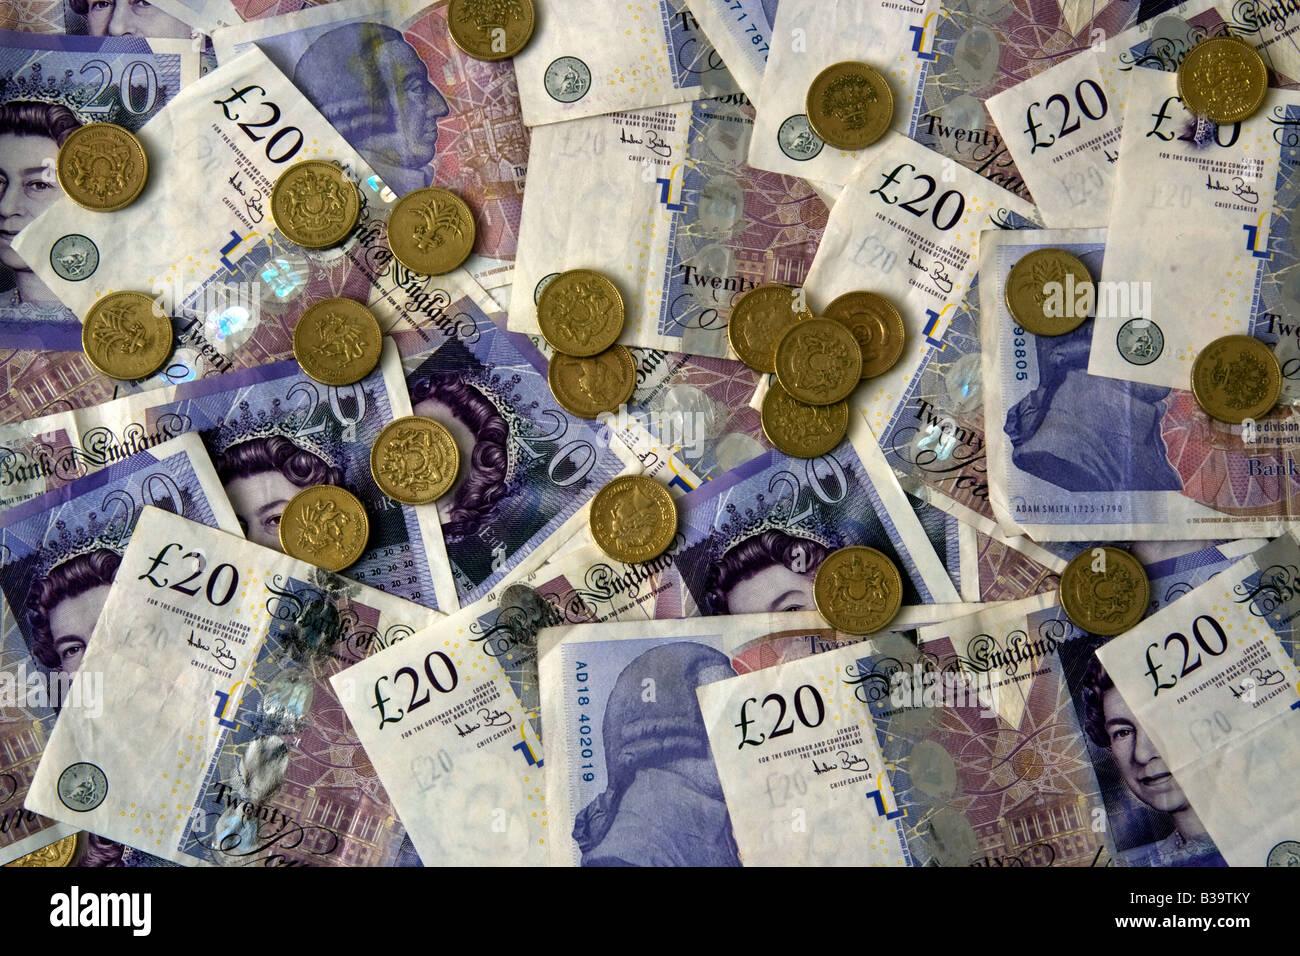 Twenty Pound Notes and Coins Money - Stock Image